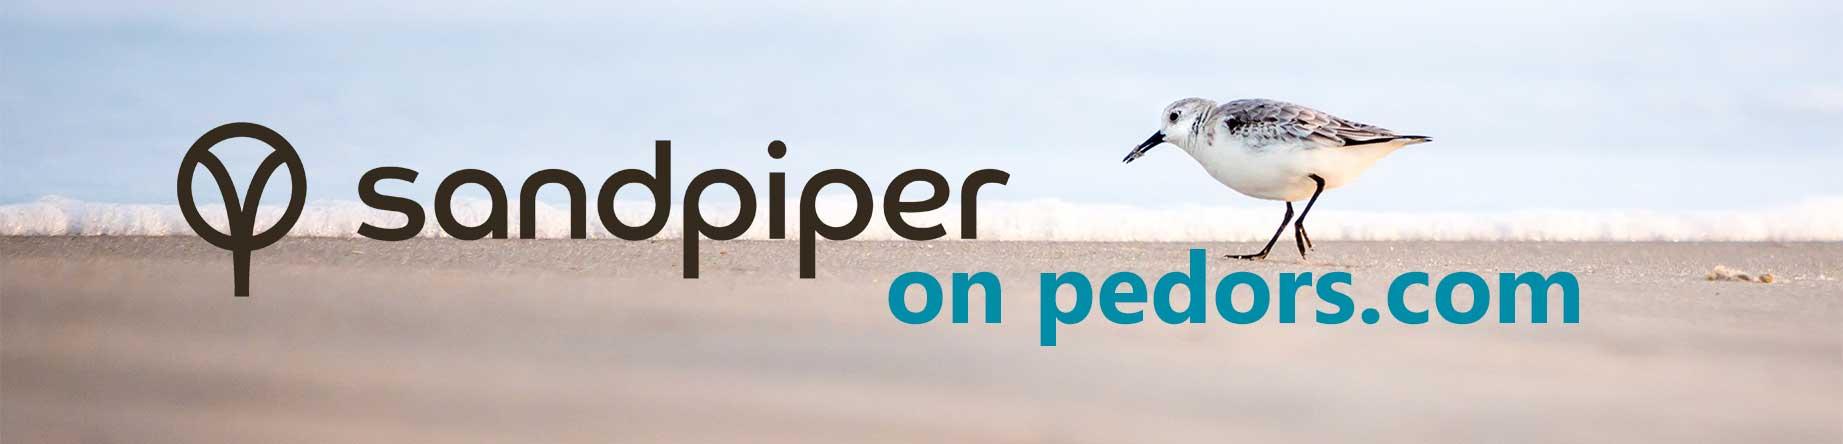 sandpiper-on-pedors.jpg